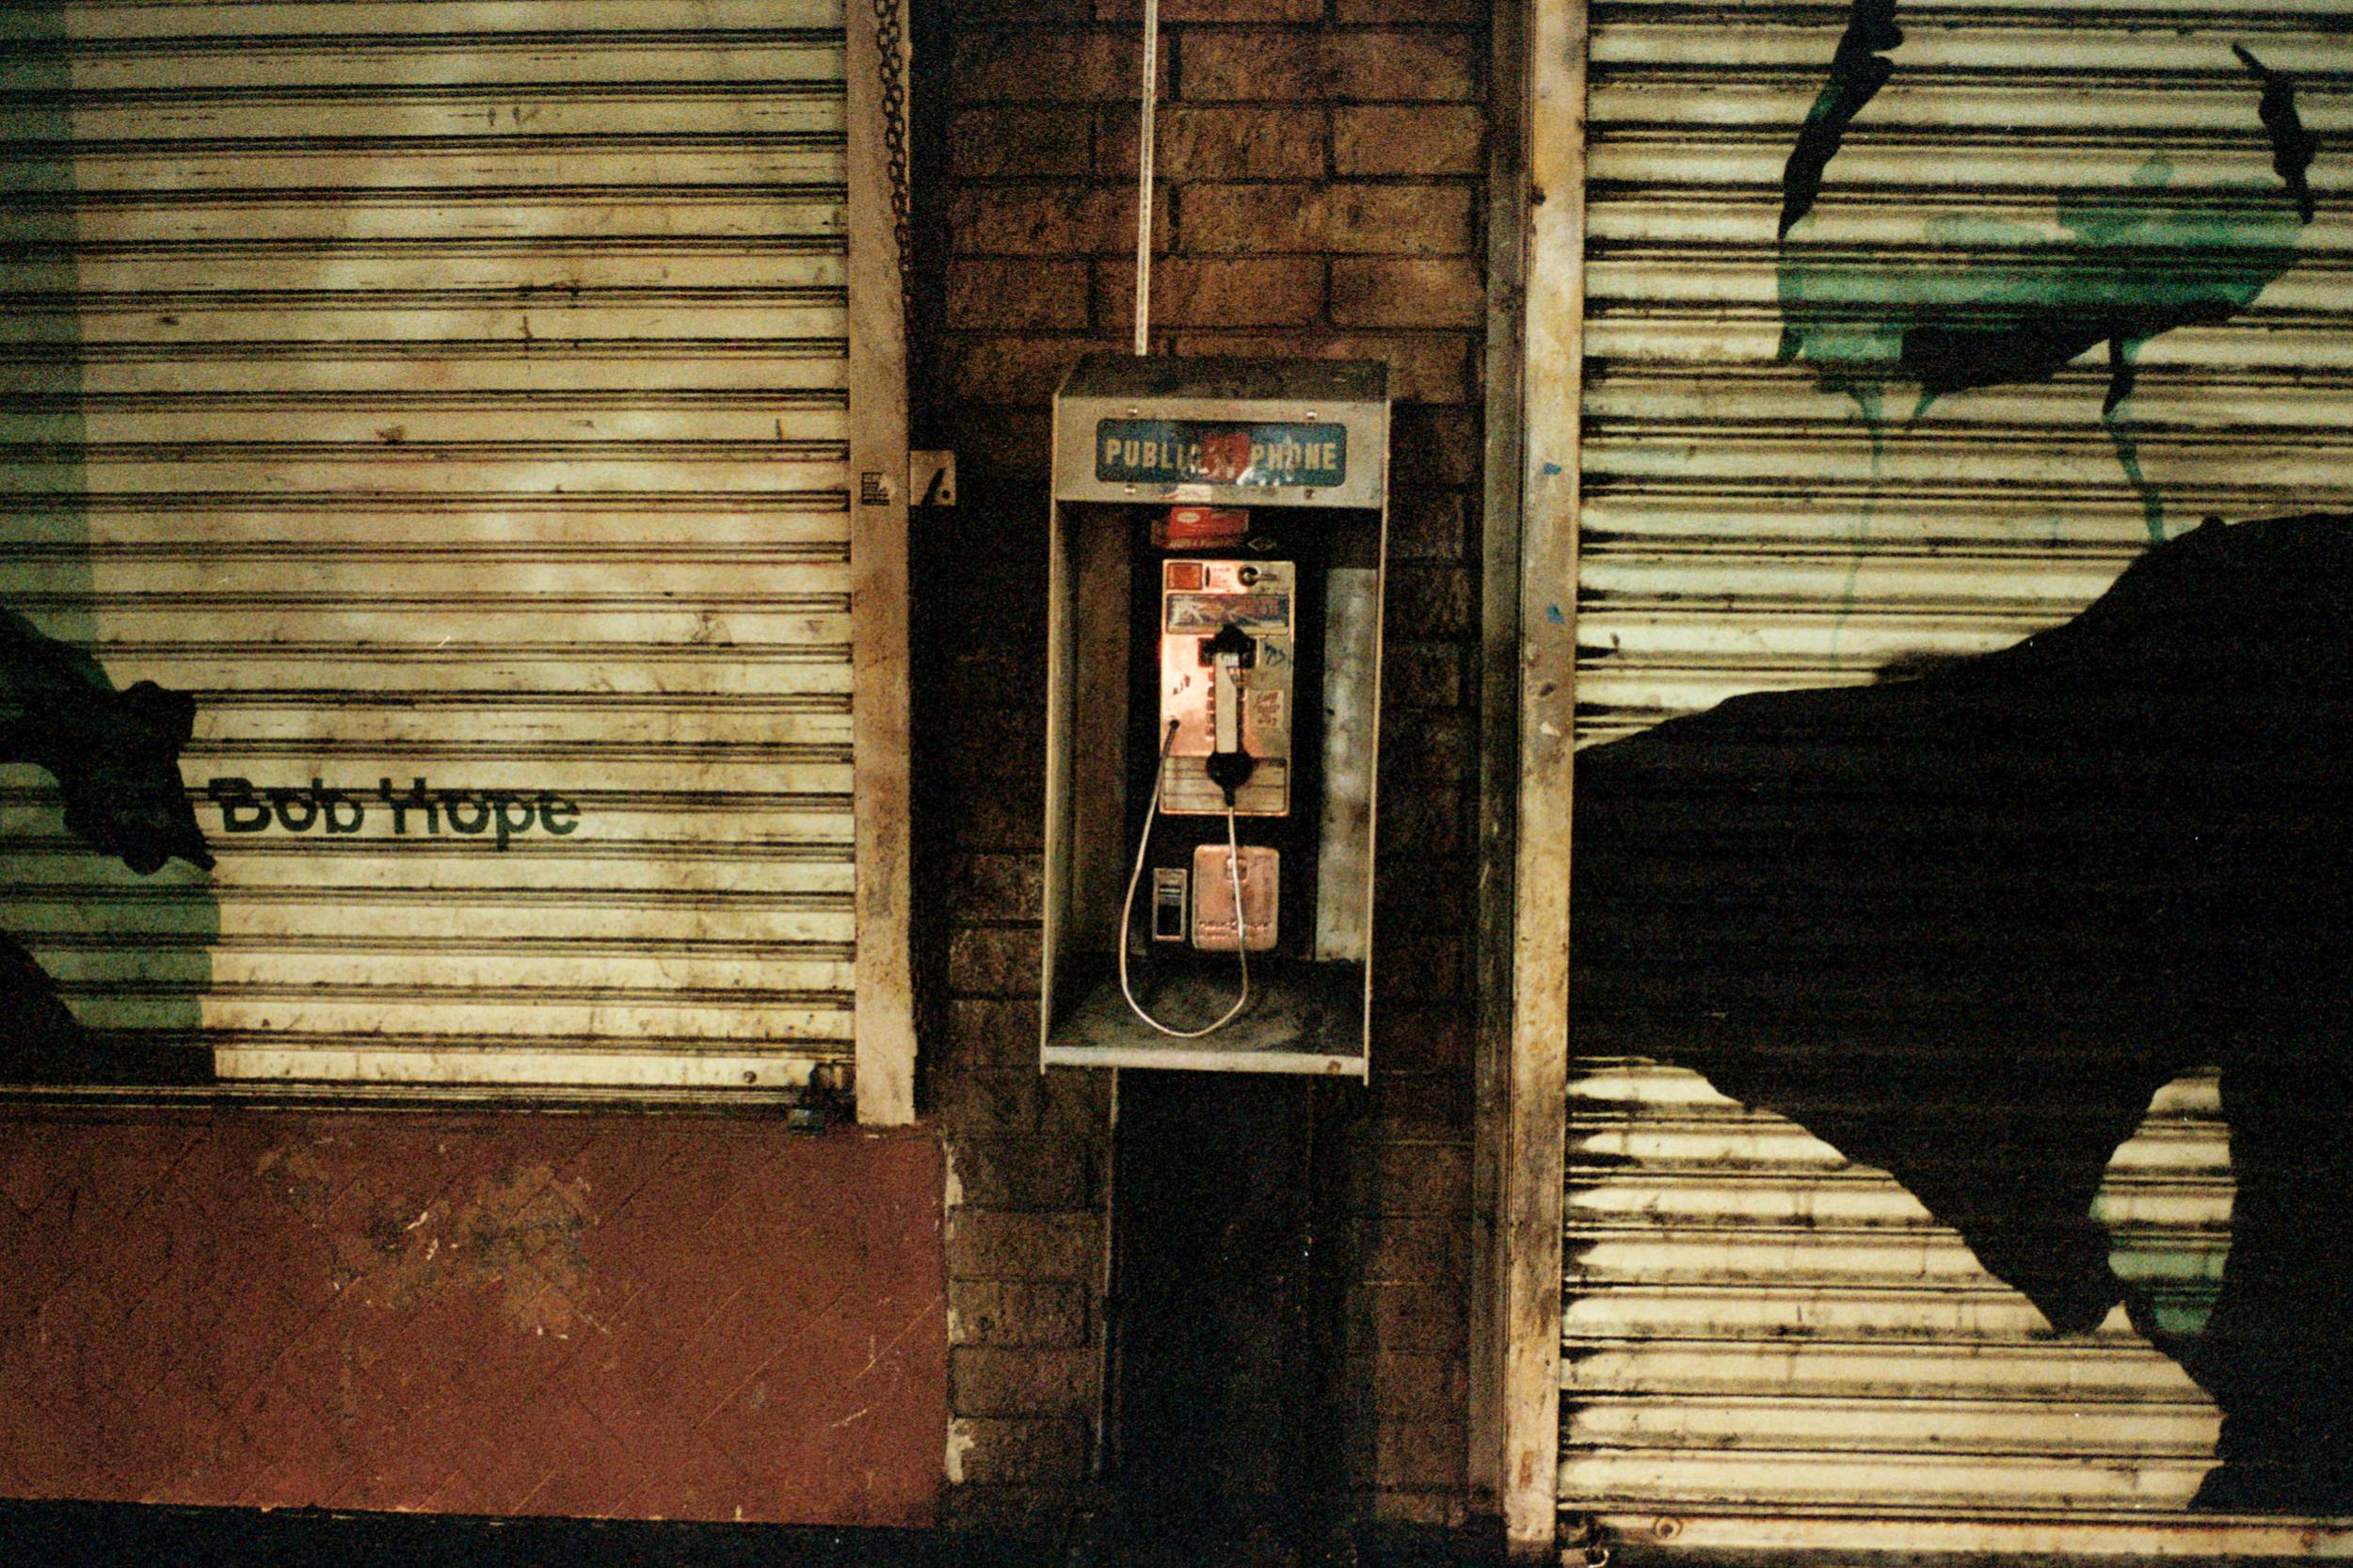 Film_Leica_cali (82 of 85).jpg